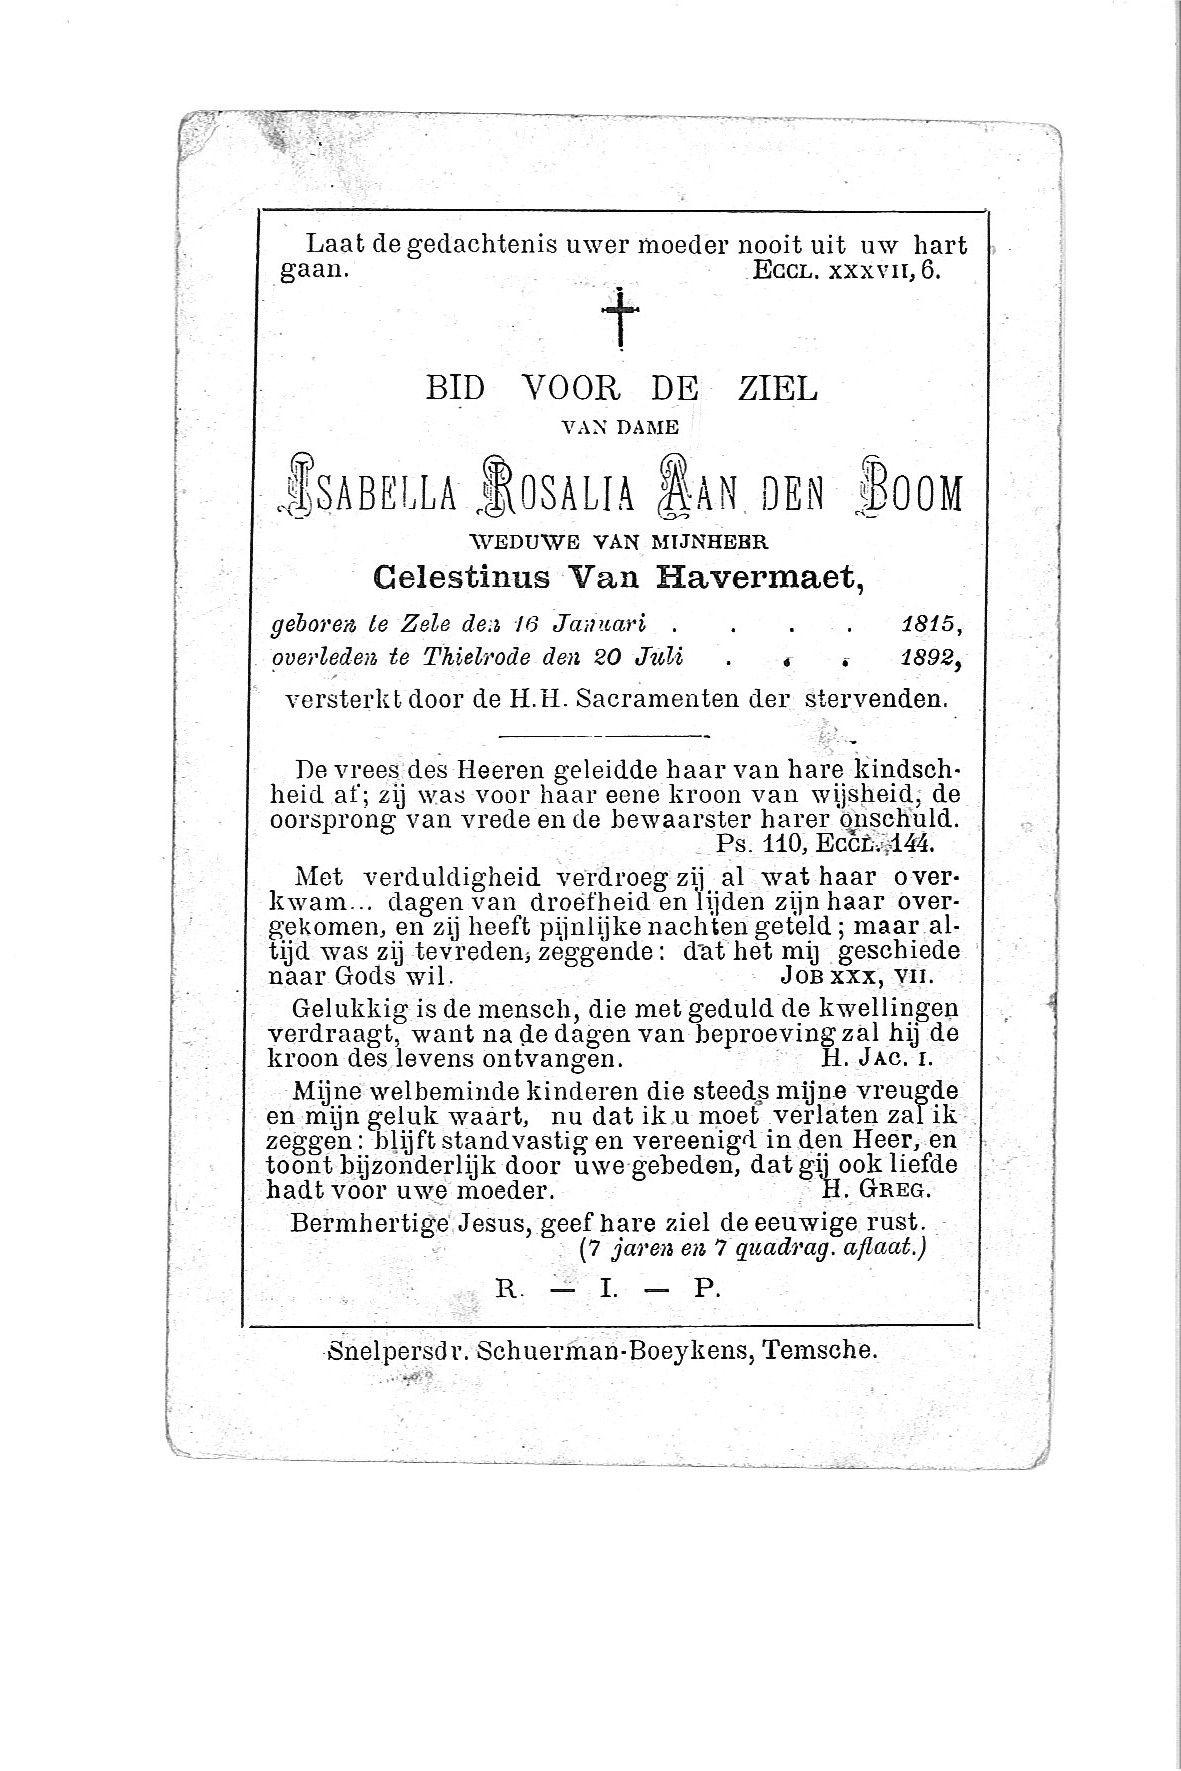 isabella-rosalia(1892)20090105113124_00002.jpg